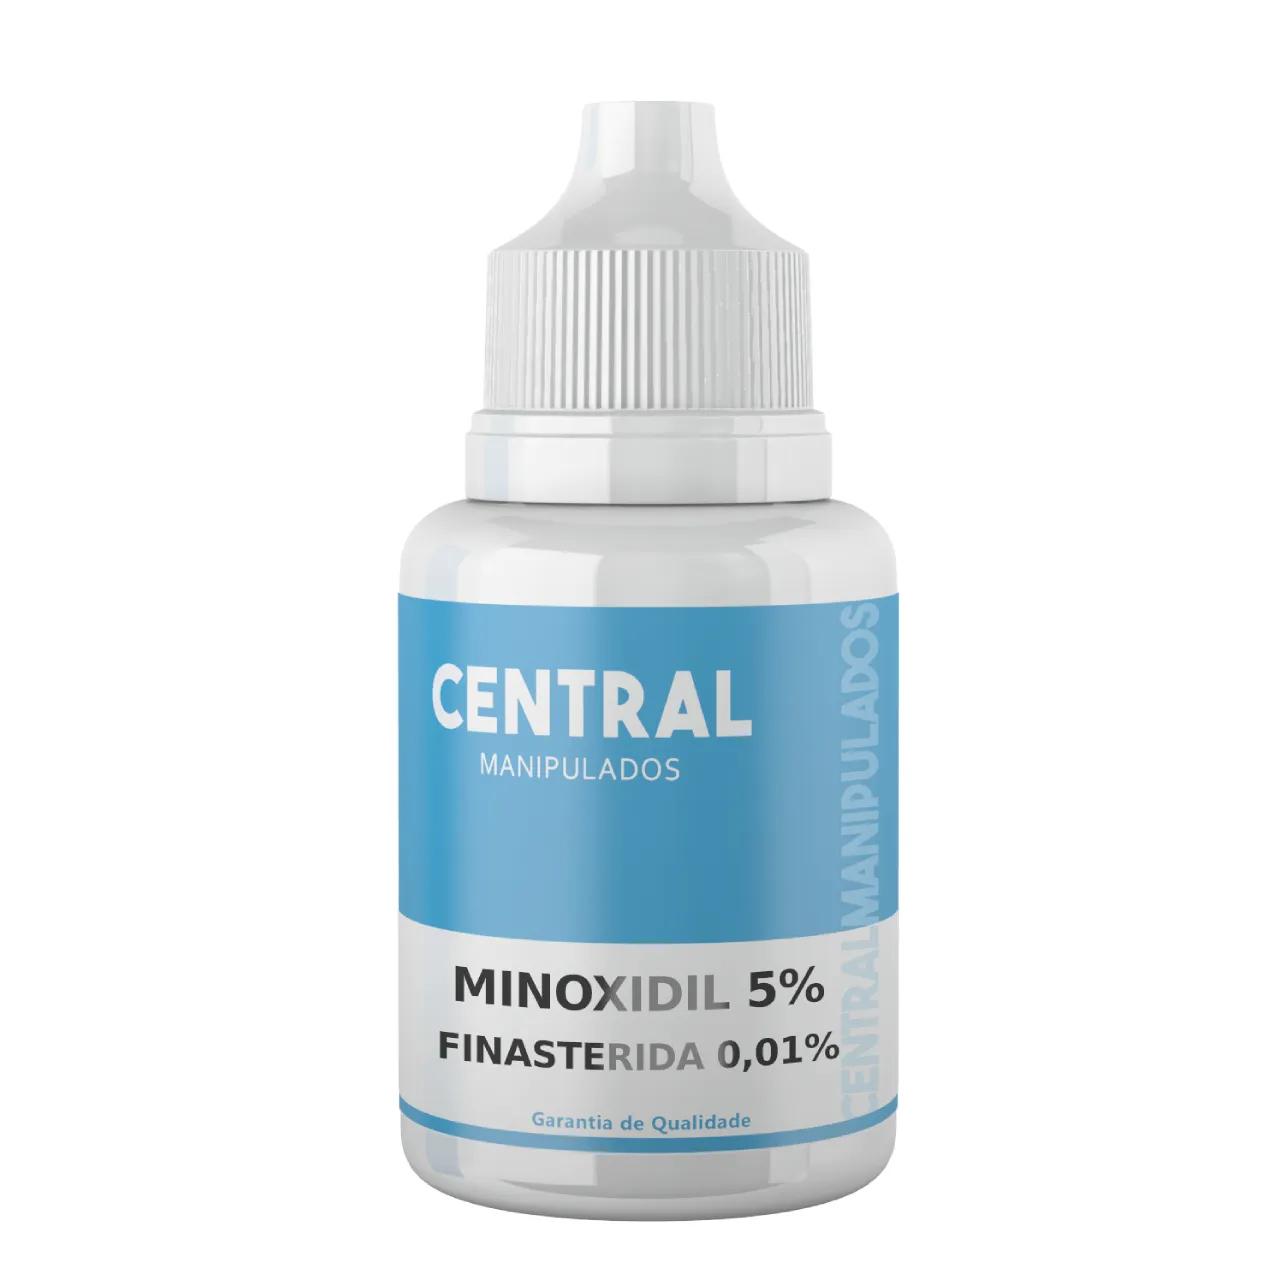 Minoxidil 5% + Finasterida 0,1%  TrichoSol  - Solução - 100ml - Tecnologia TrichoConcept da Fragon